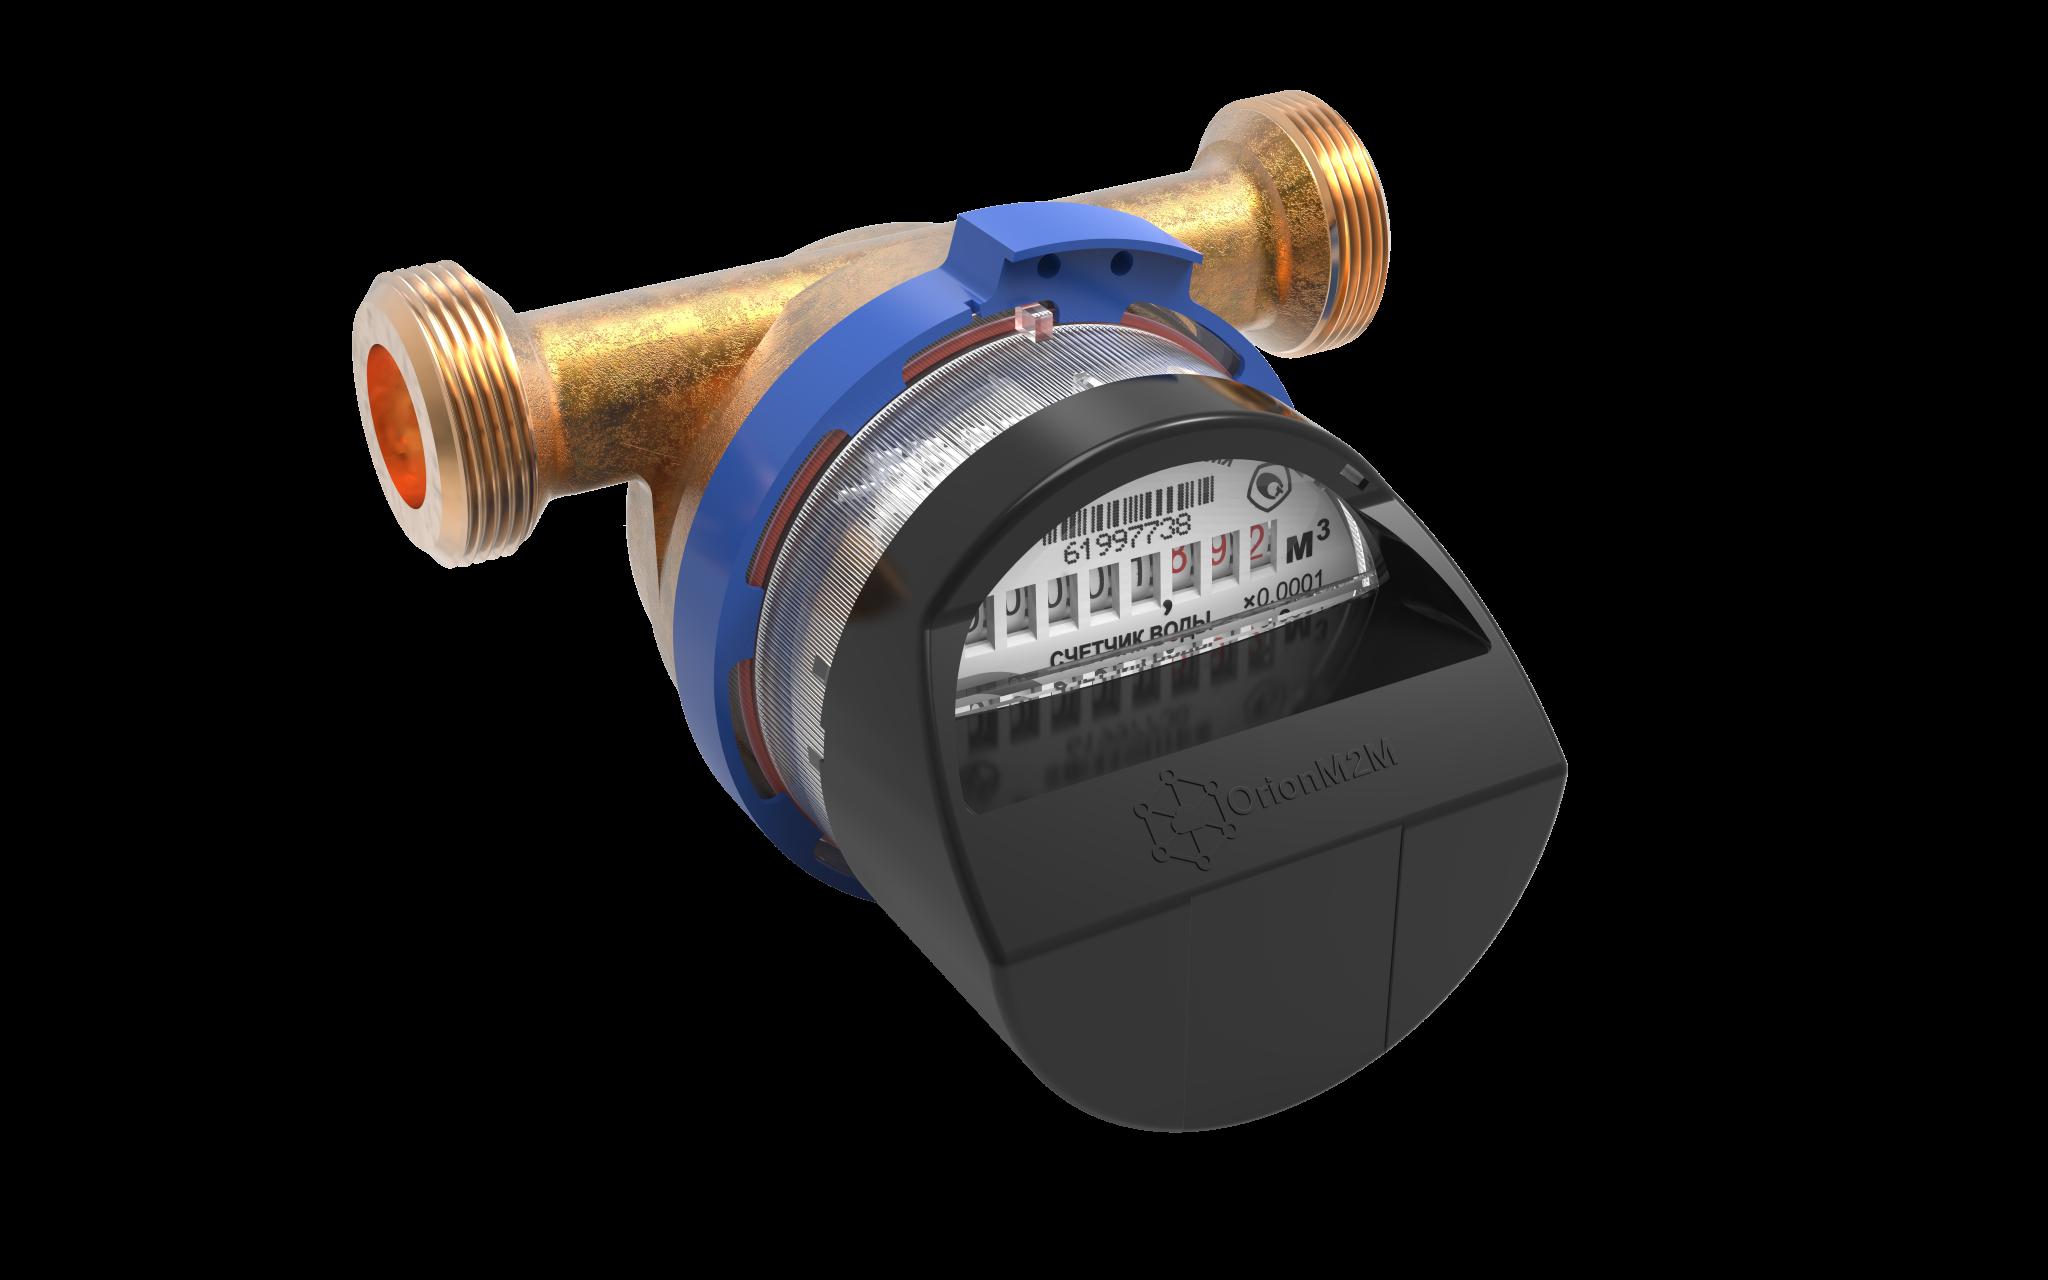 ORIONmeter ORN-TWM-LW868